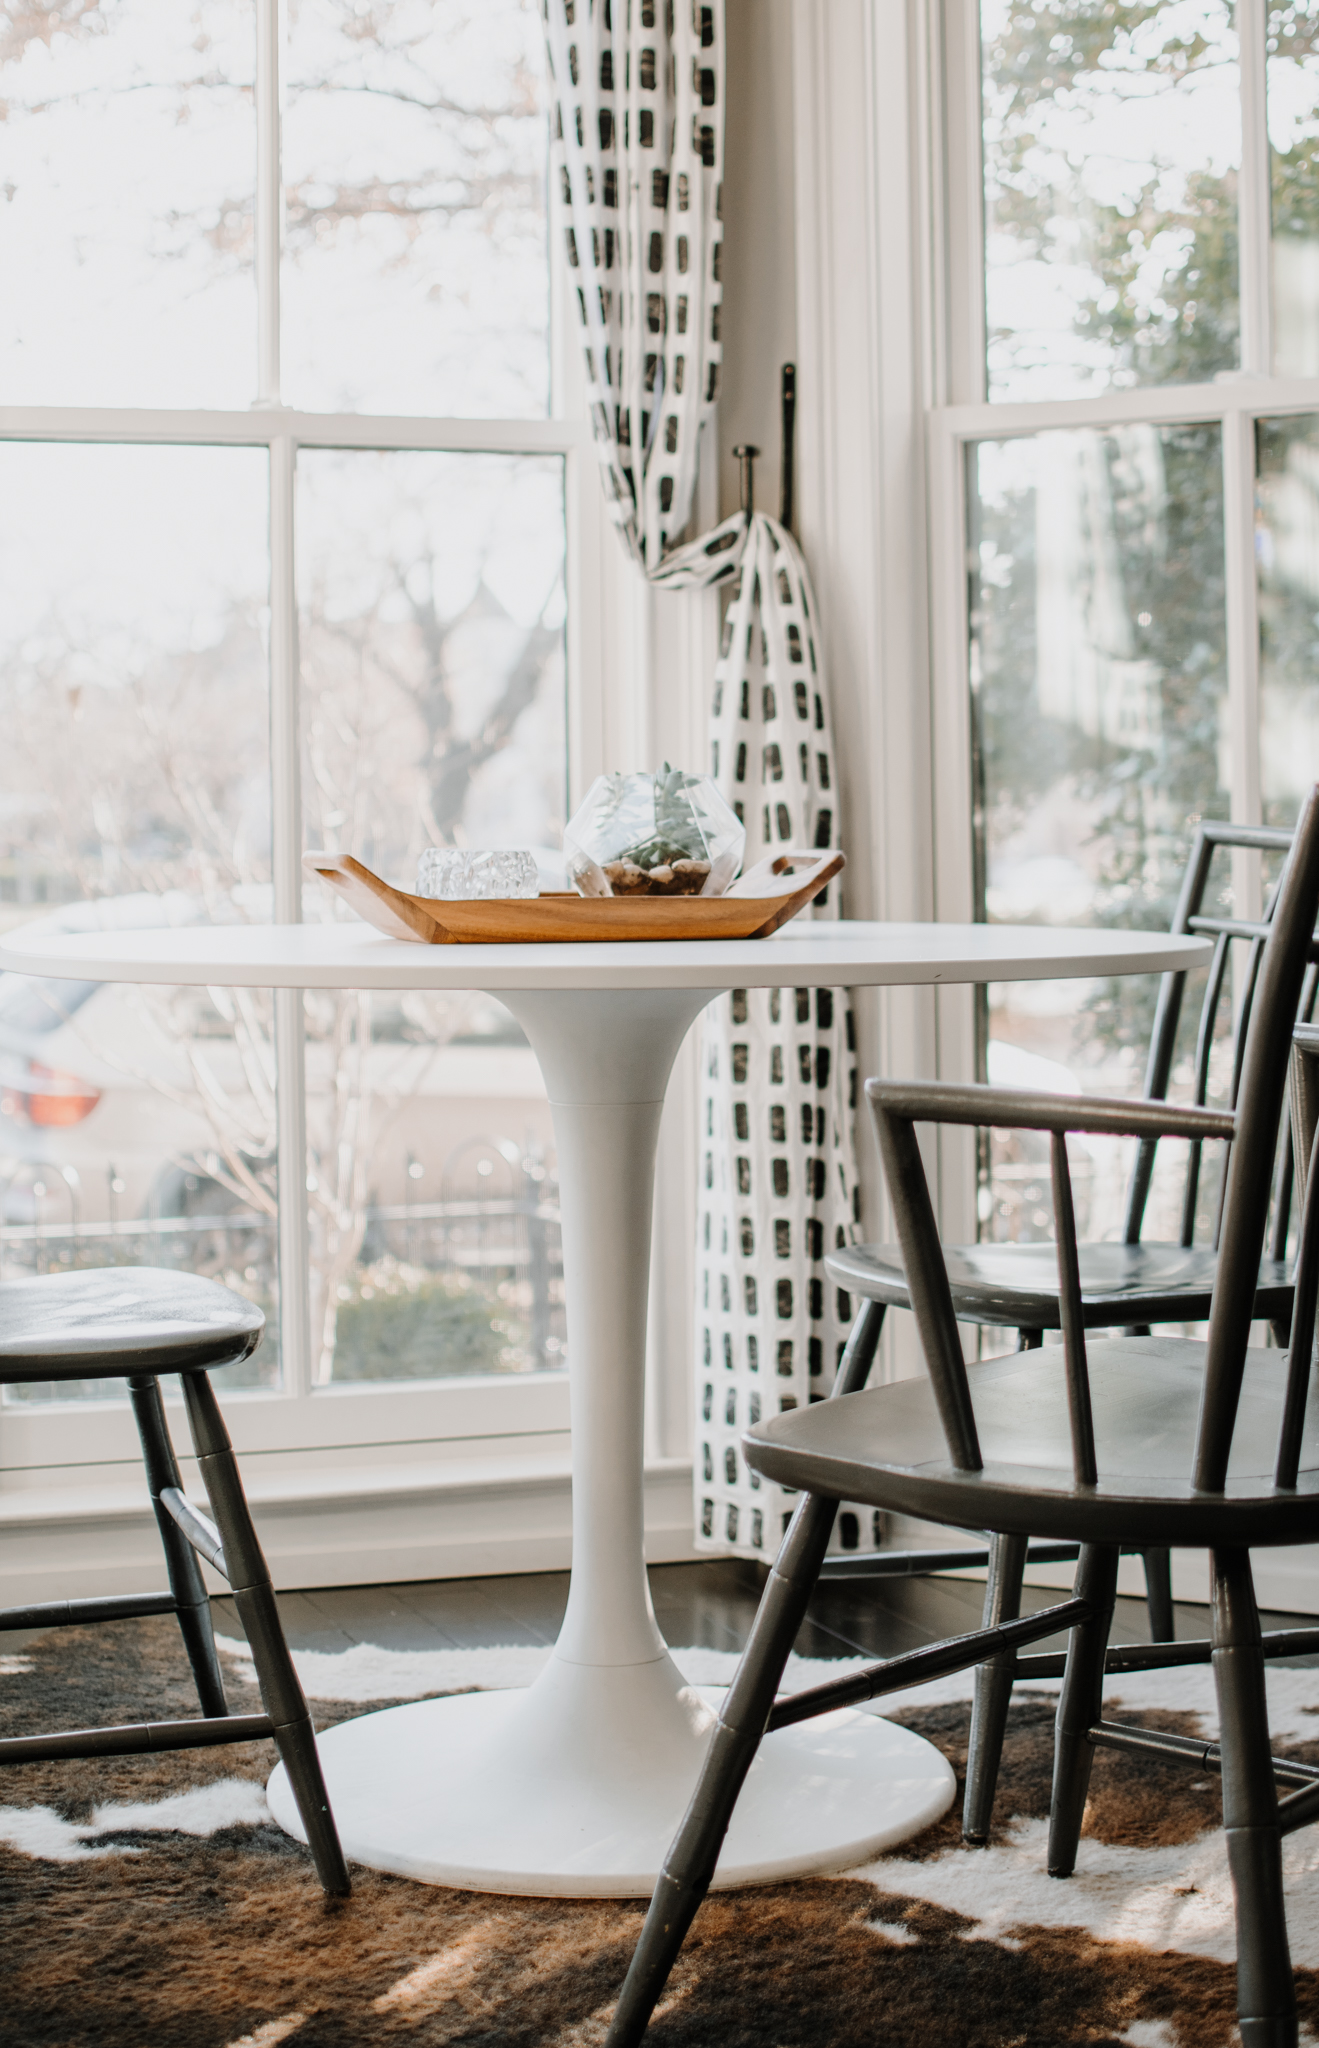 ikea docksta table material - refinish the docksta table